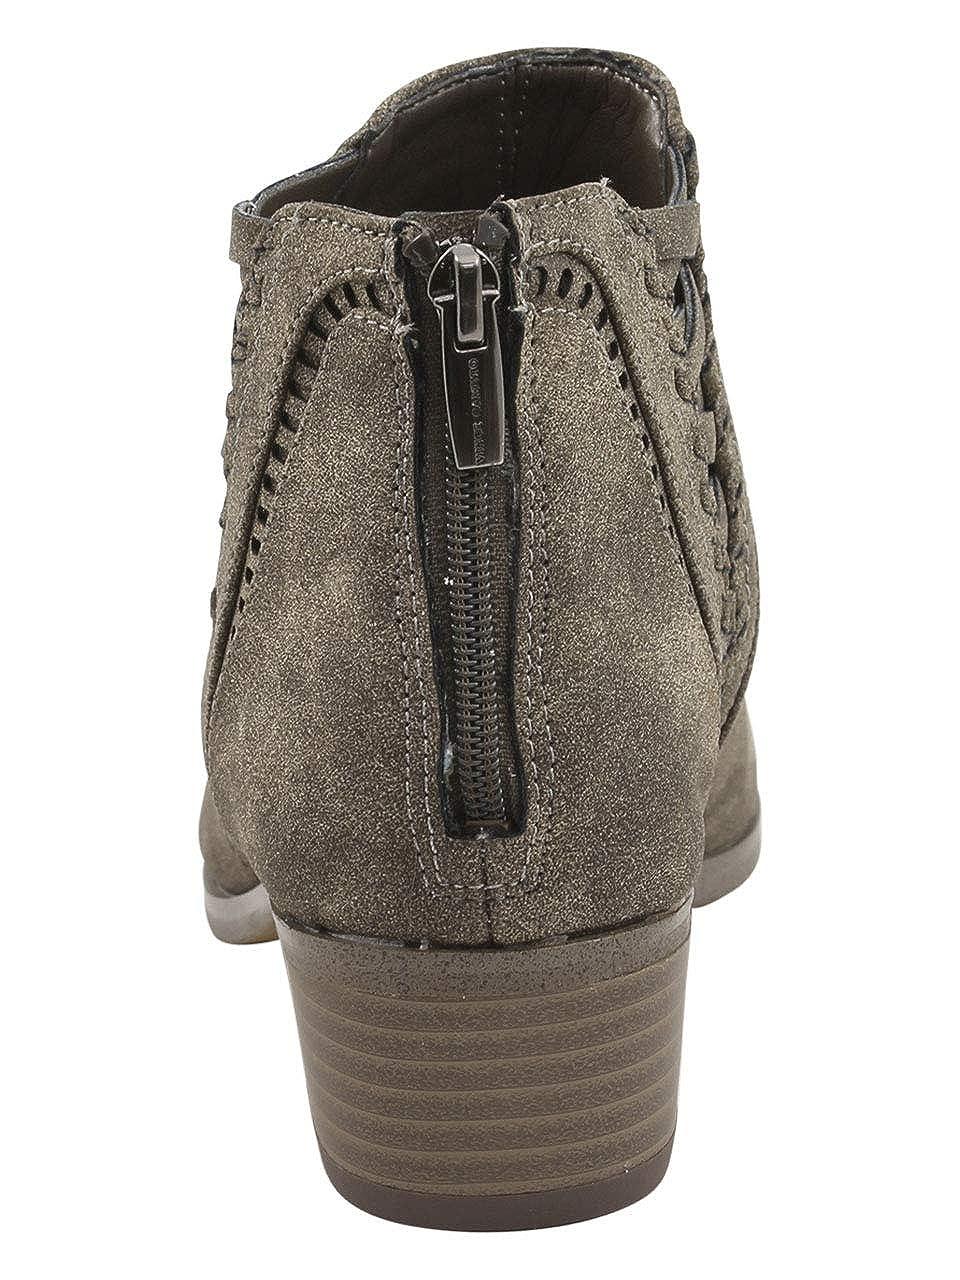 Vince Camuto Little//Big Girls Pleun Ankle Boots Shoes